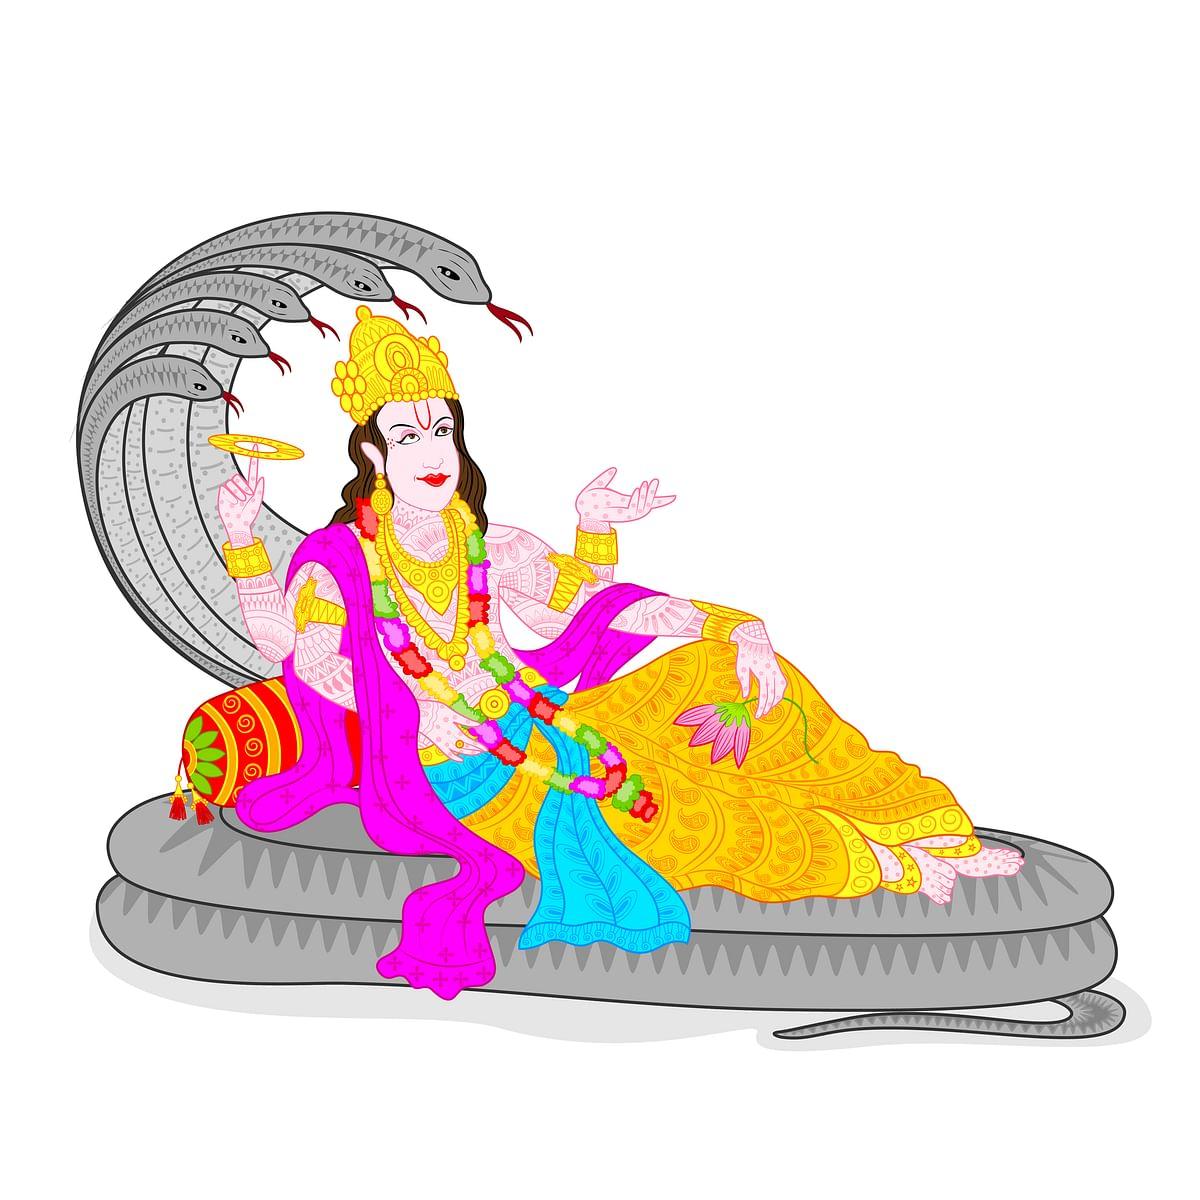 सफला एकादशी व्रत विधि- Saphala Ekadashi Puja Vrat Vidhi in Hindi